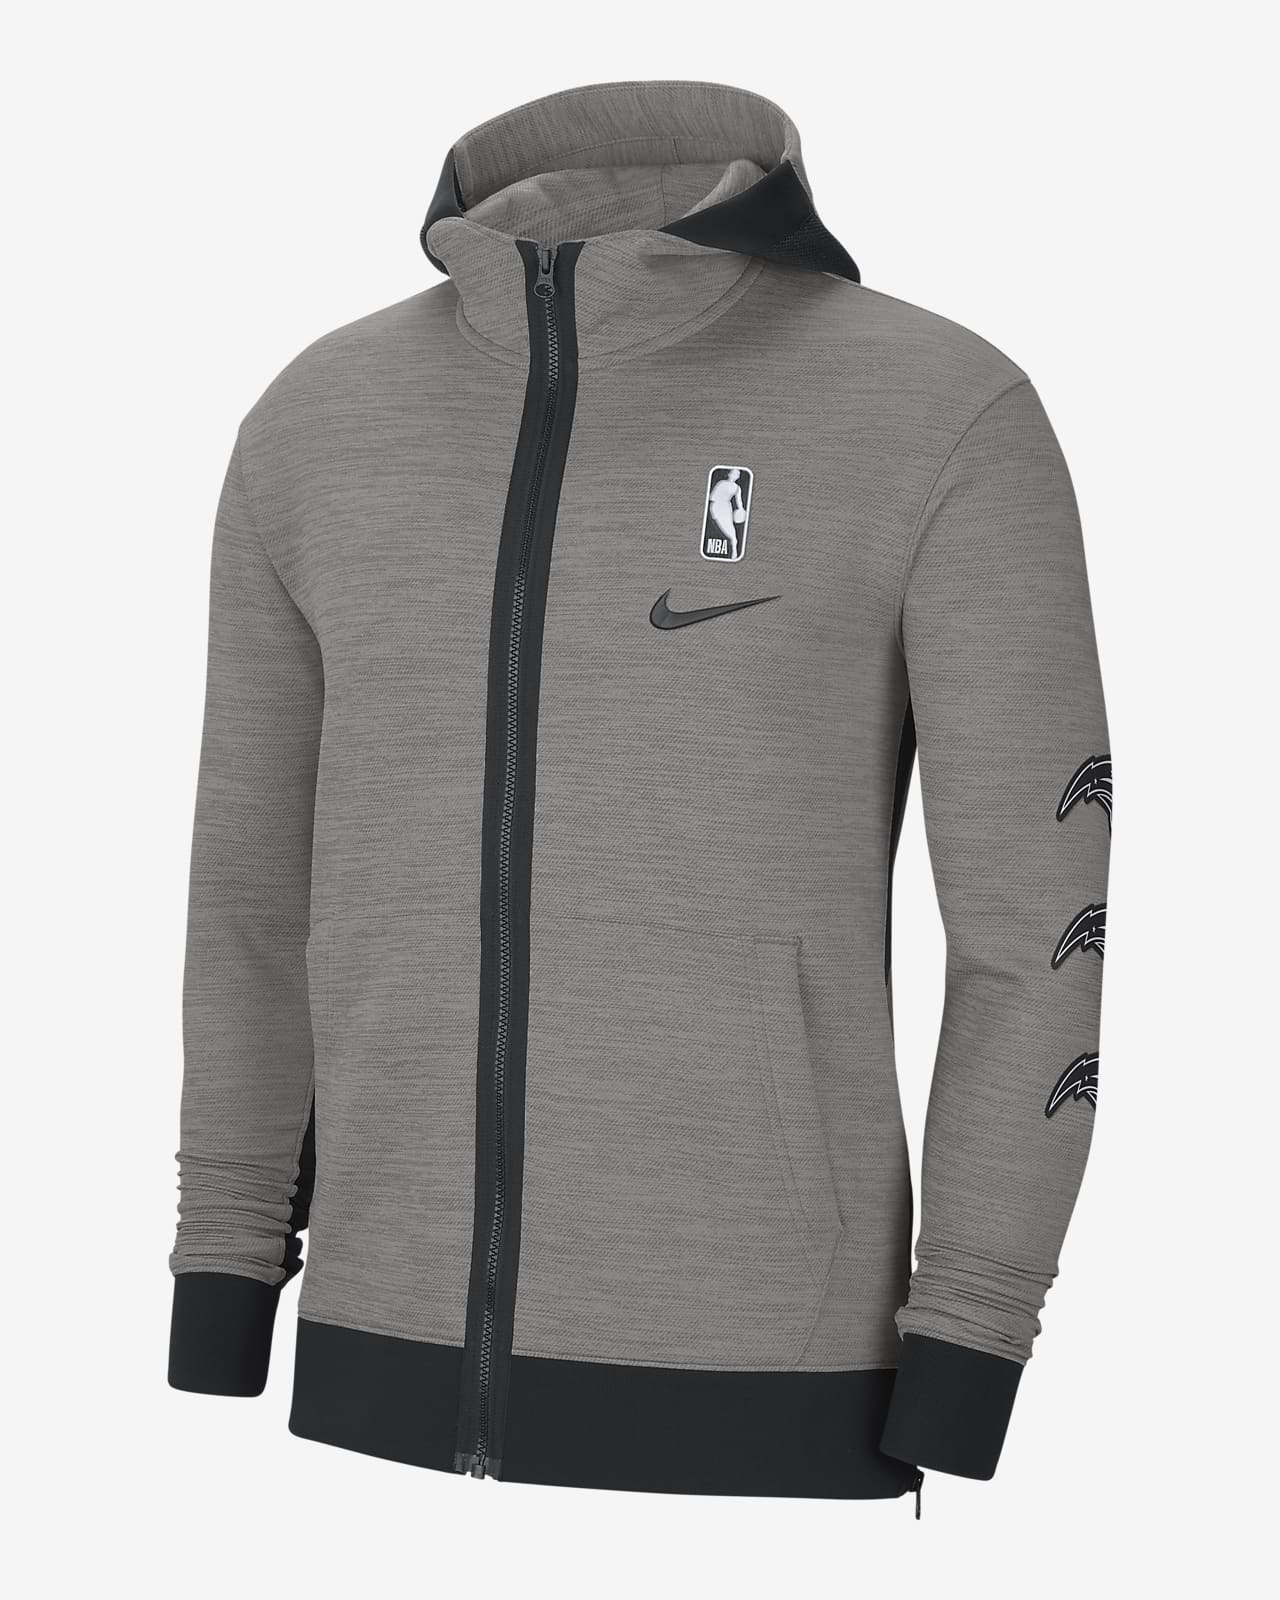 Magic Showtime Men's Nike Therma Flex NBA Hoodie